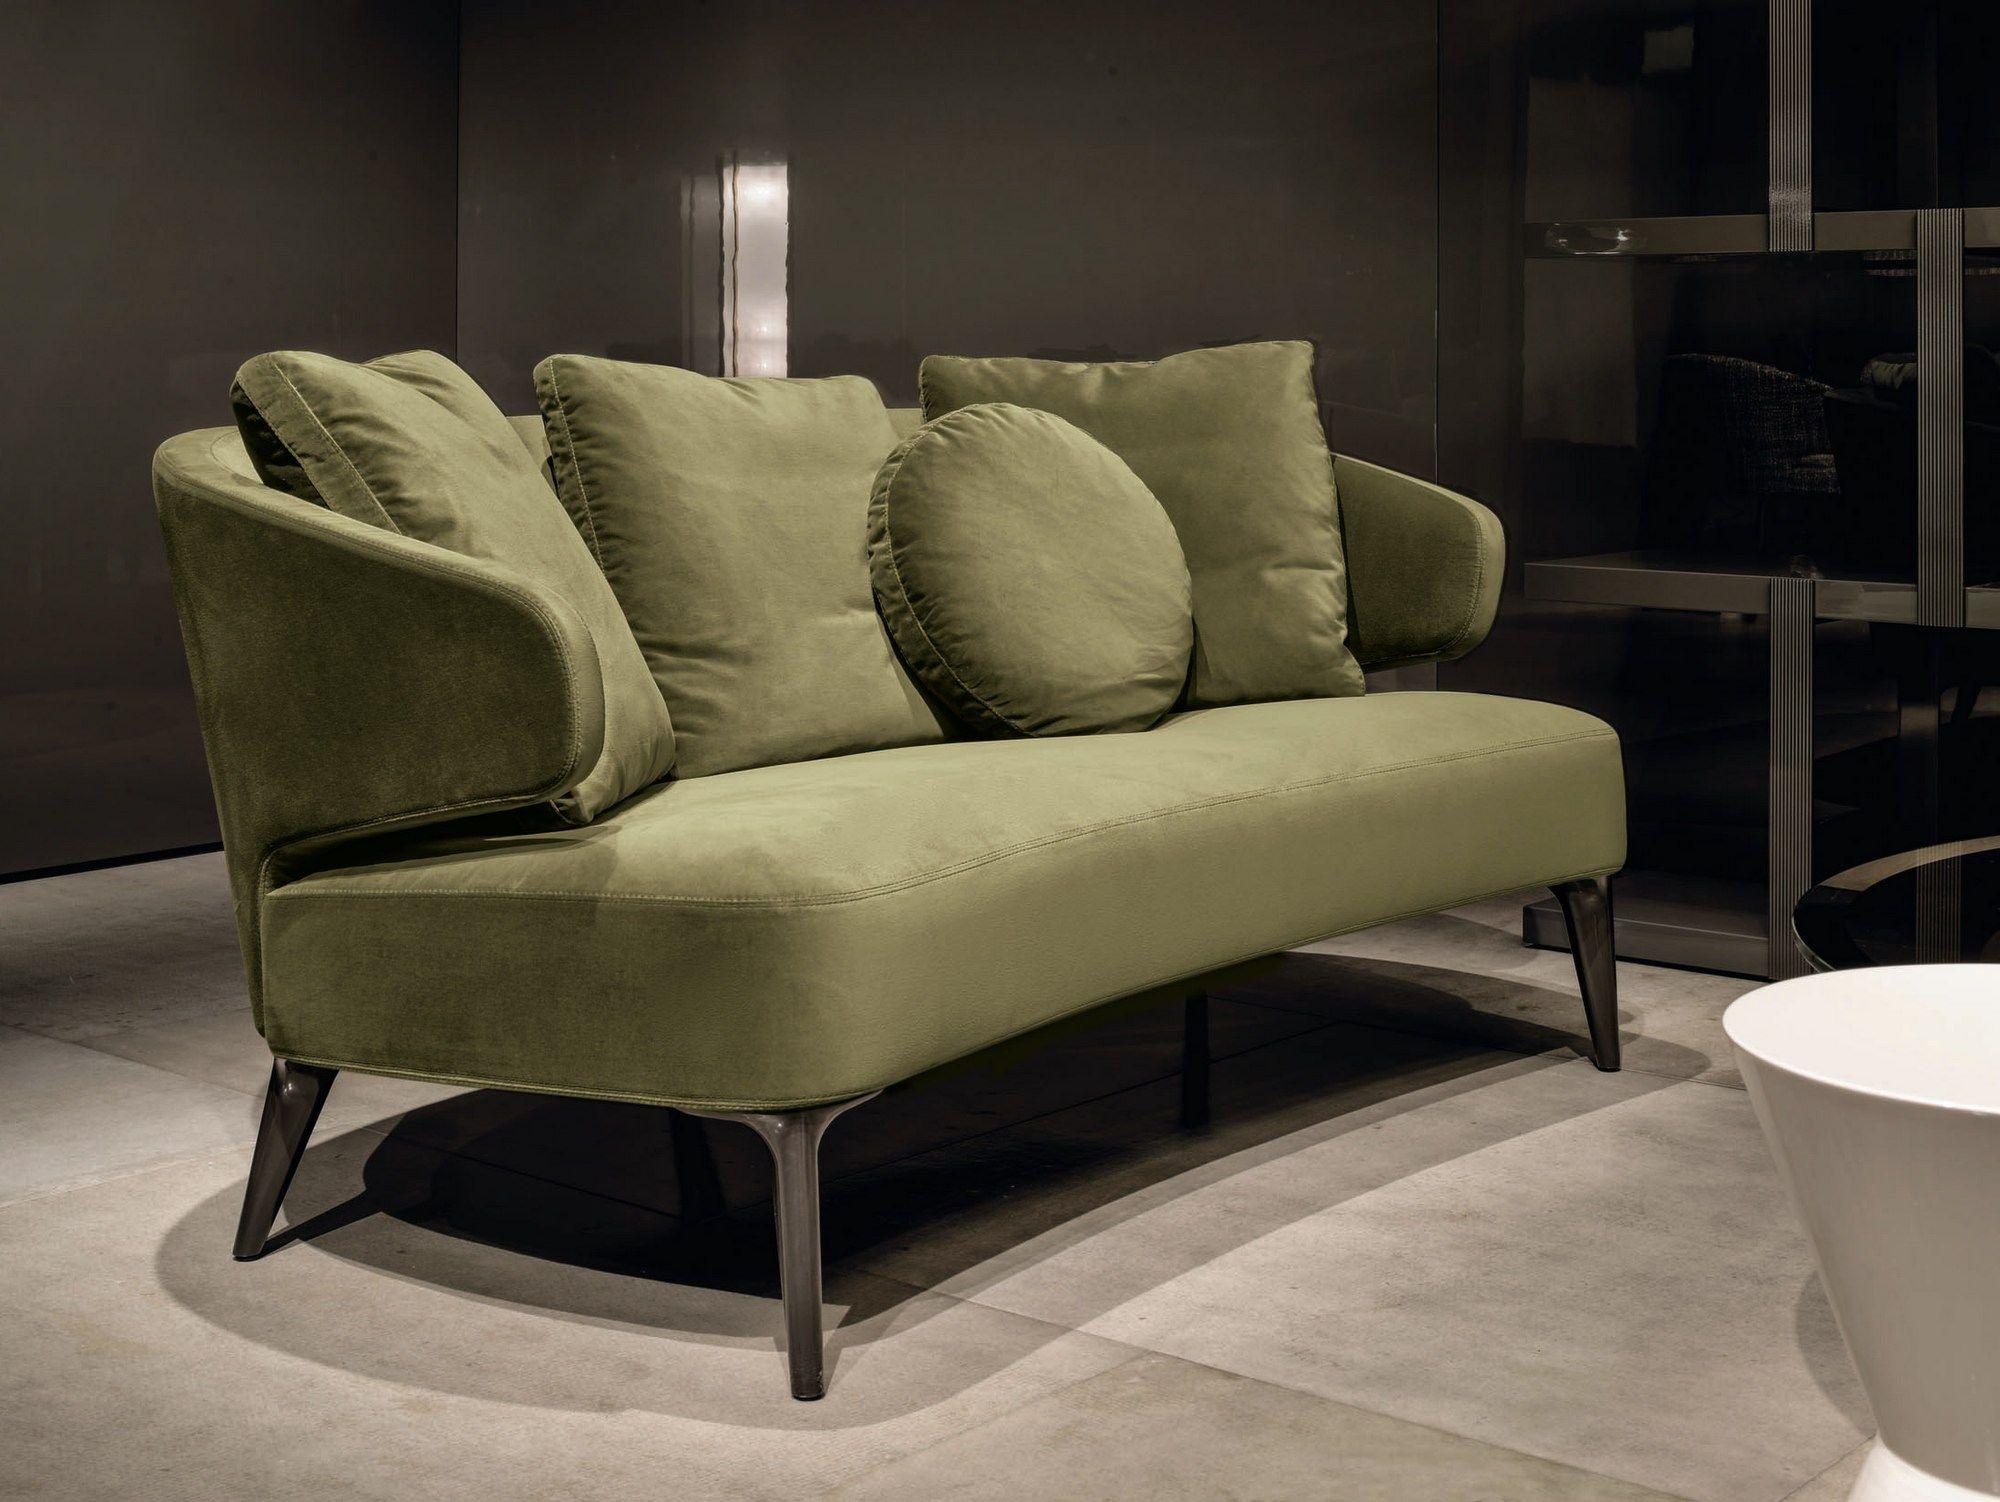 Download The Catalogue And Request Prices Of Aston By Minotti Sofa Design Rodolfo Dordoni Aston Series Sofa Furniture Fabric Sofa Furniture